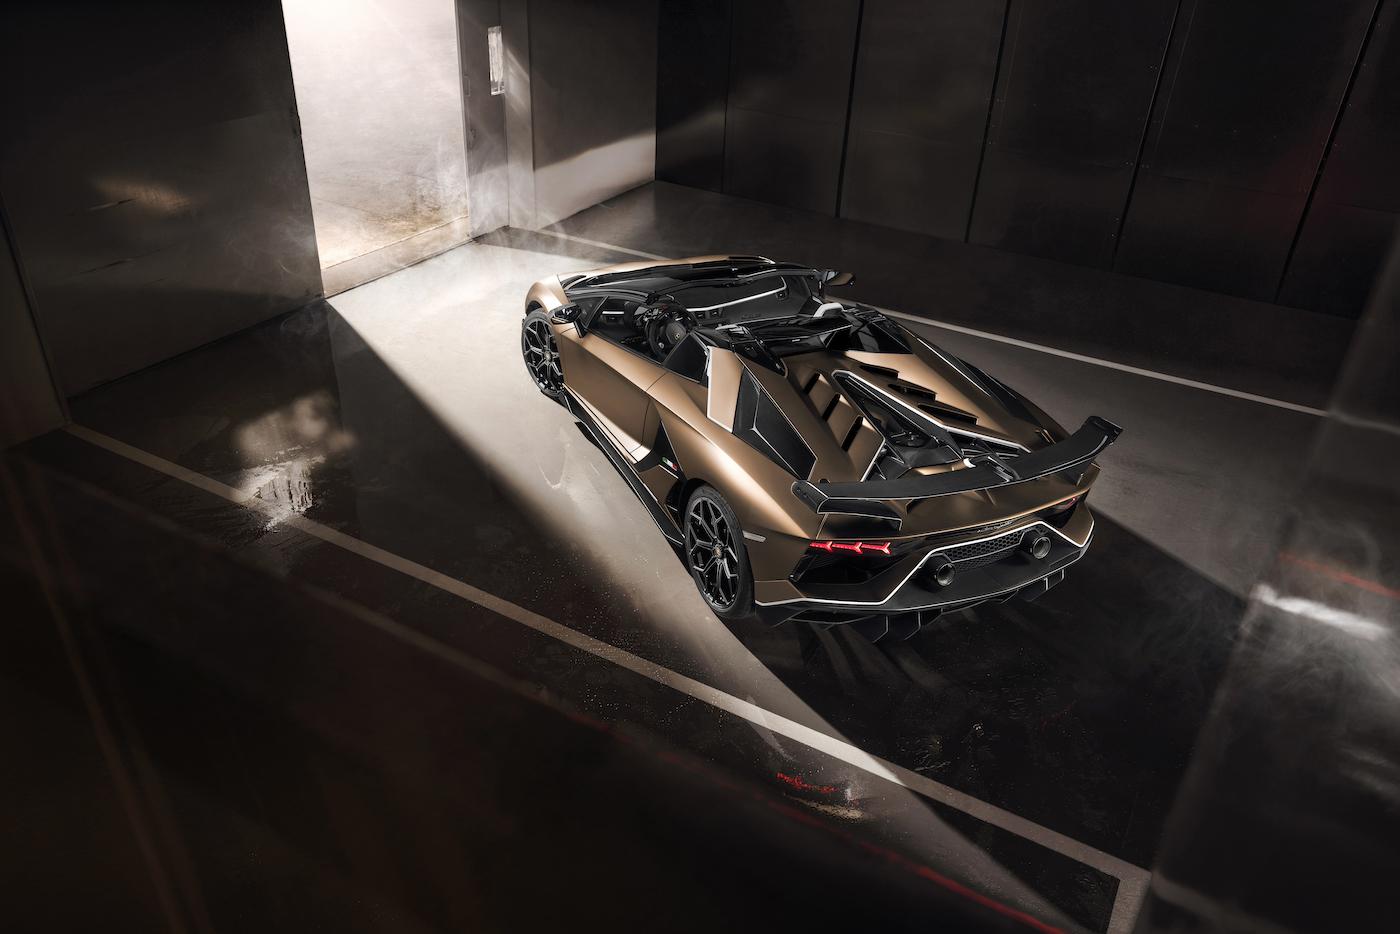 Oben ohne mit 350 km/h: Lamborghini präsentiert den Aventador SVJ Roadster in Genf 17